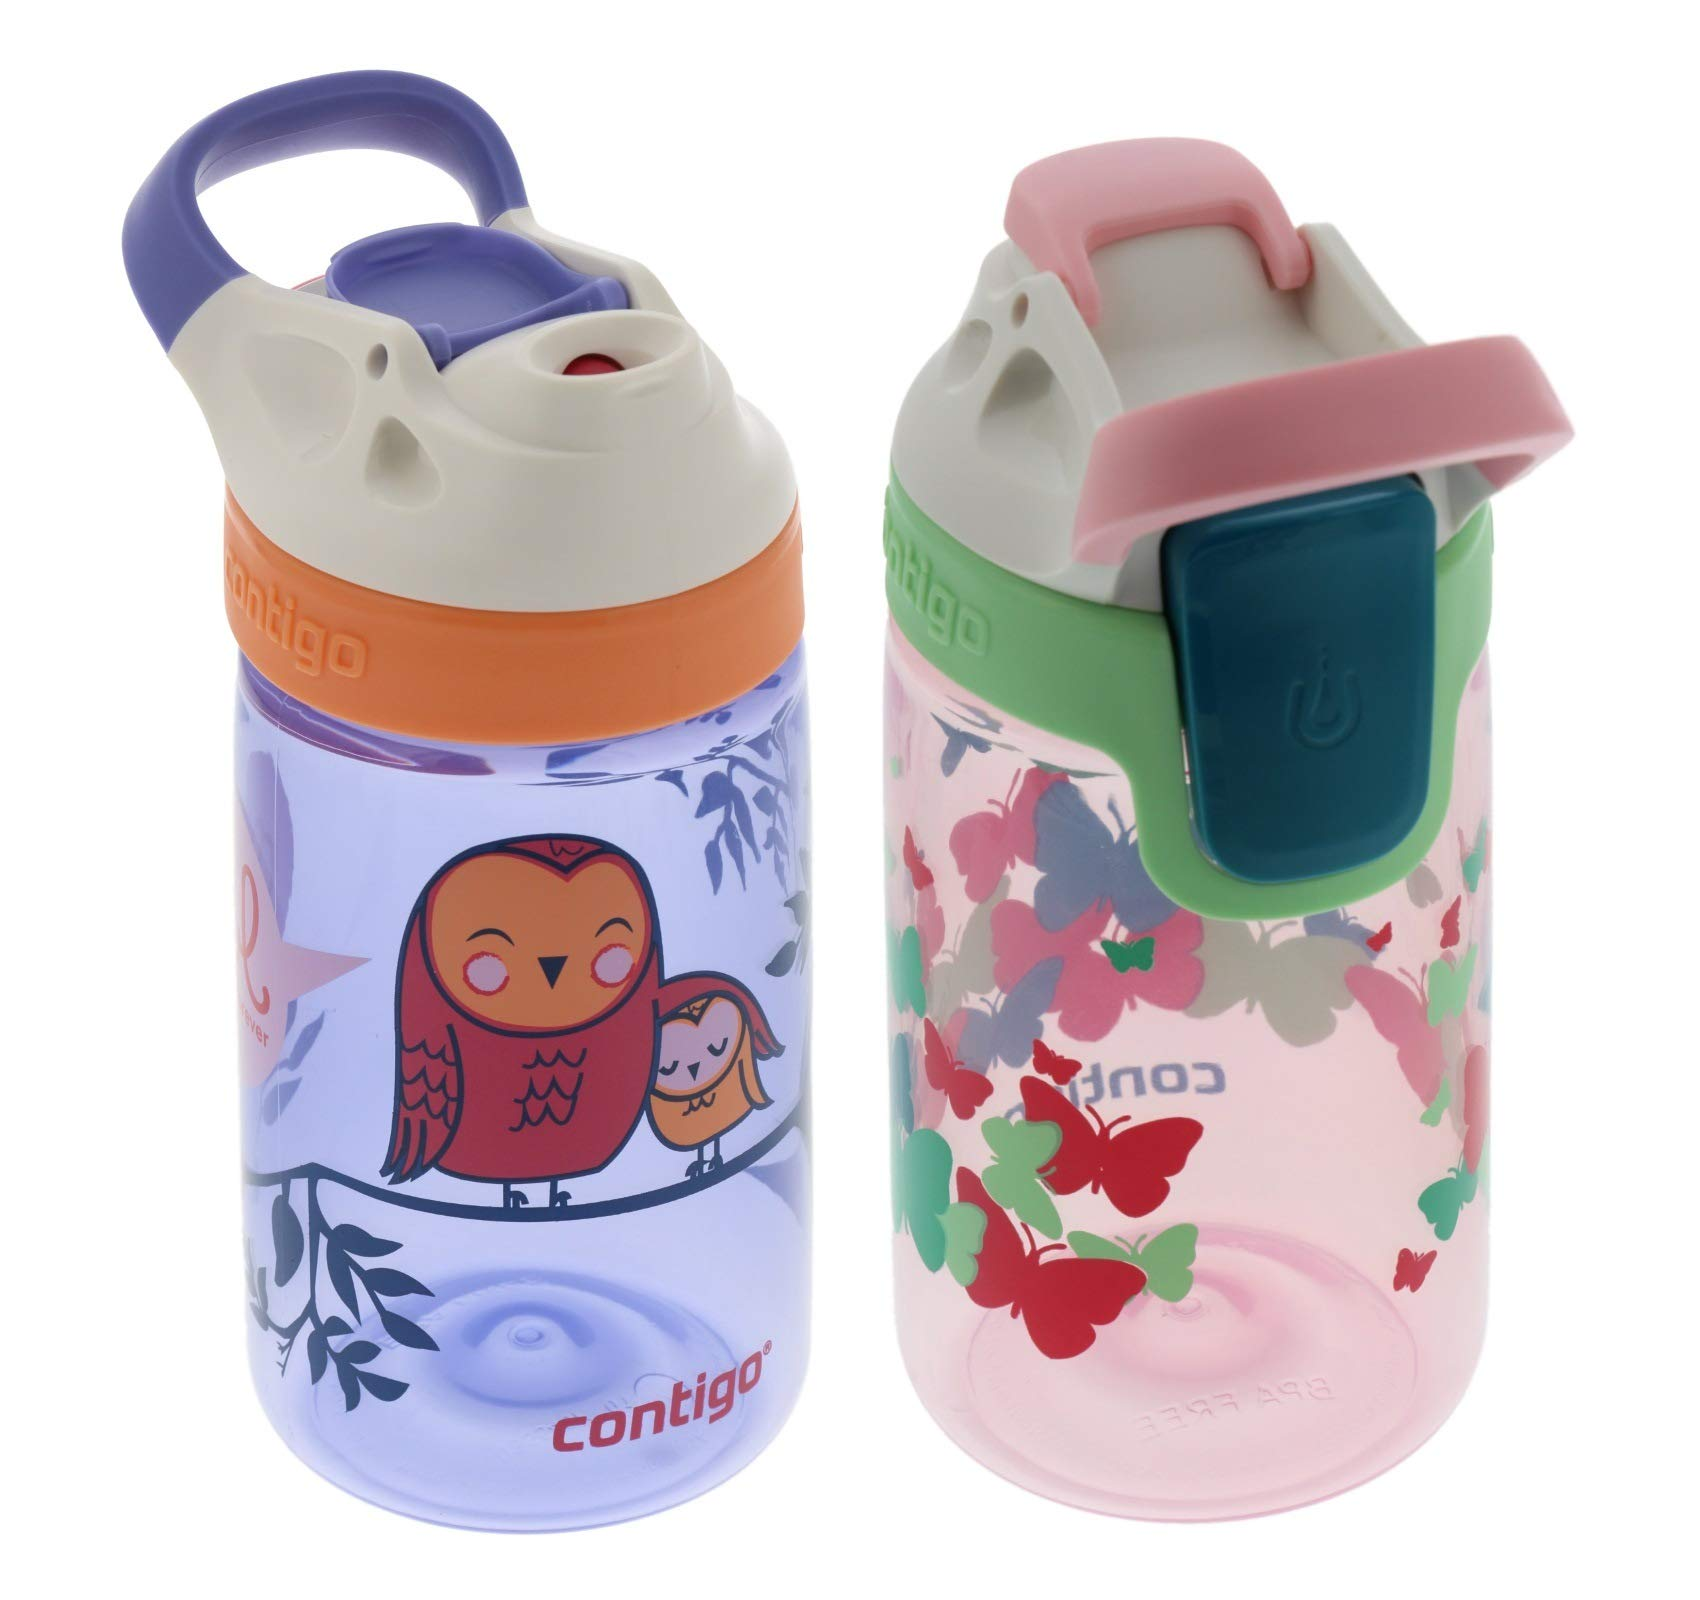 Contigo 14oz Kids Autoseal Gizmo Sip Water Bottles, Ballet & Love (2 Pack) - Perfect for Children & Parents on the Go